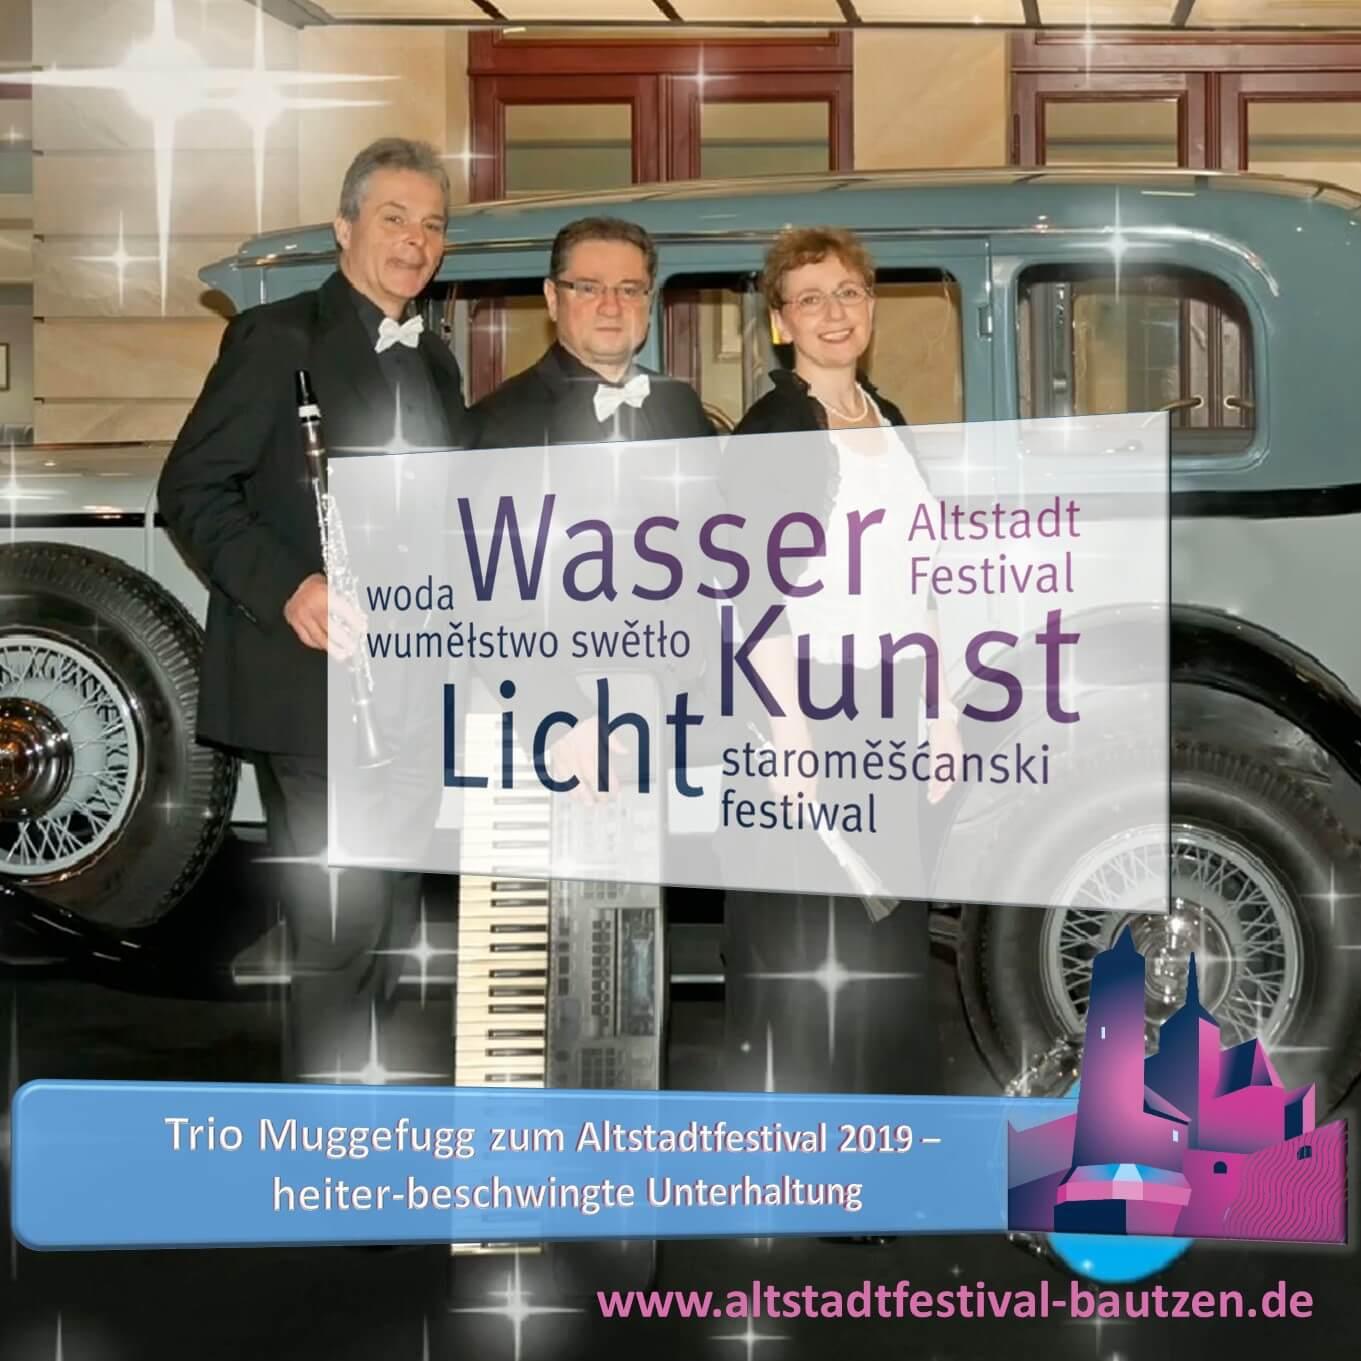 Beitrag Trio Muggefugg zum Altstadtfestival 2019-2